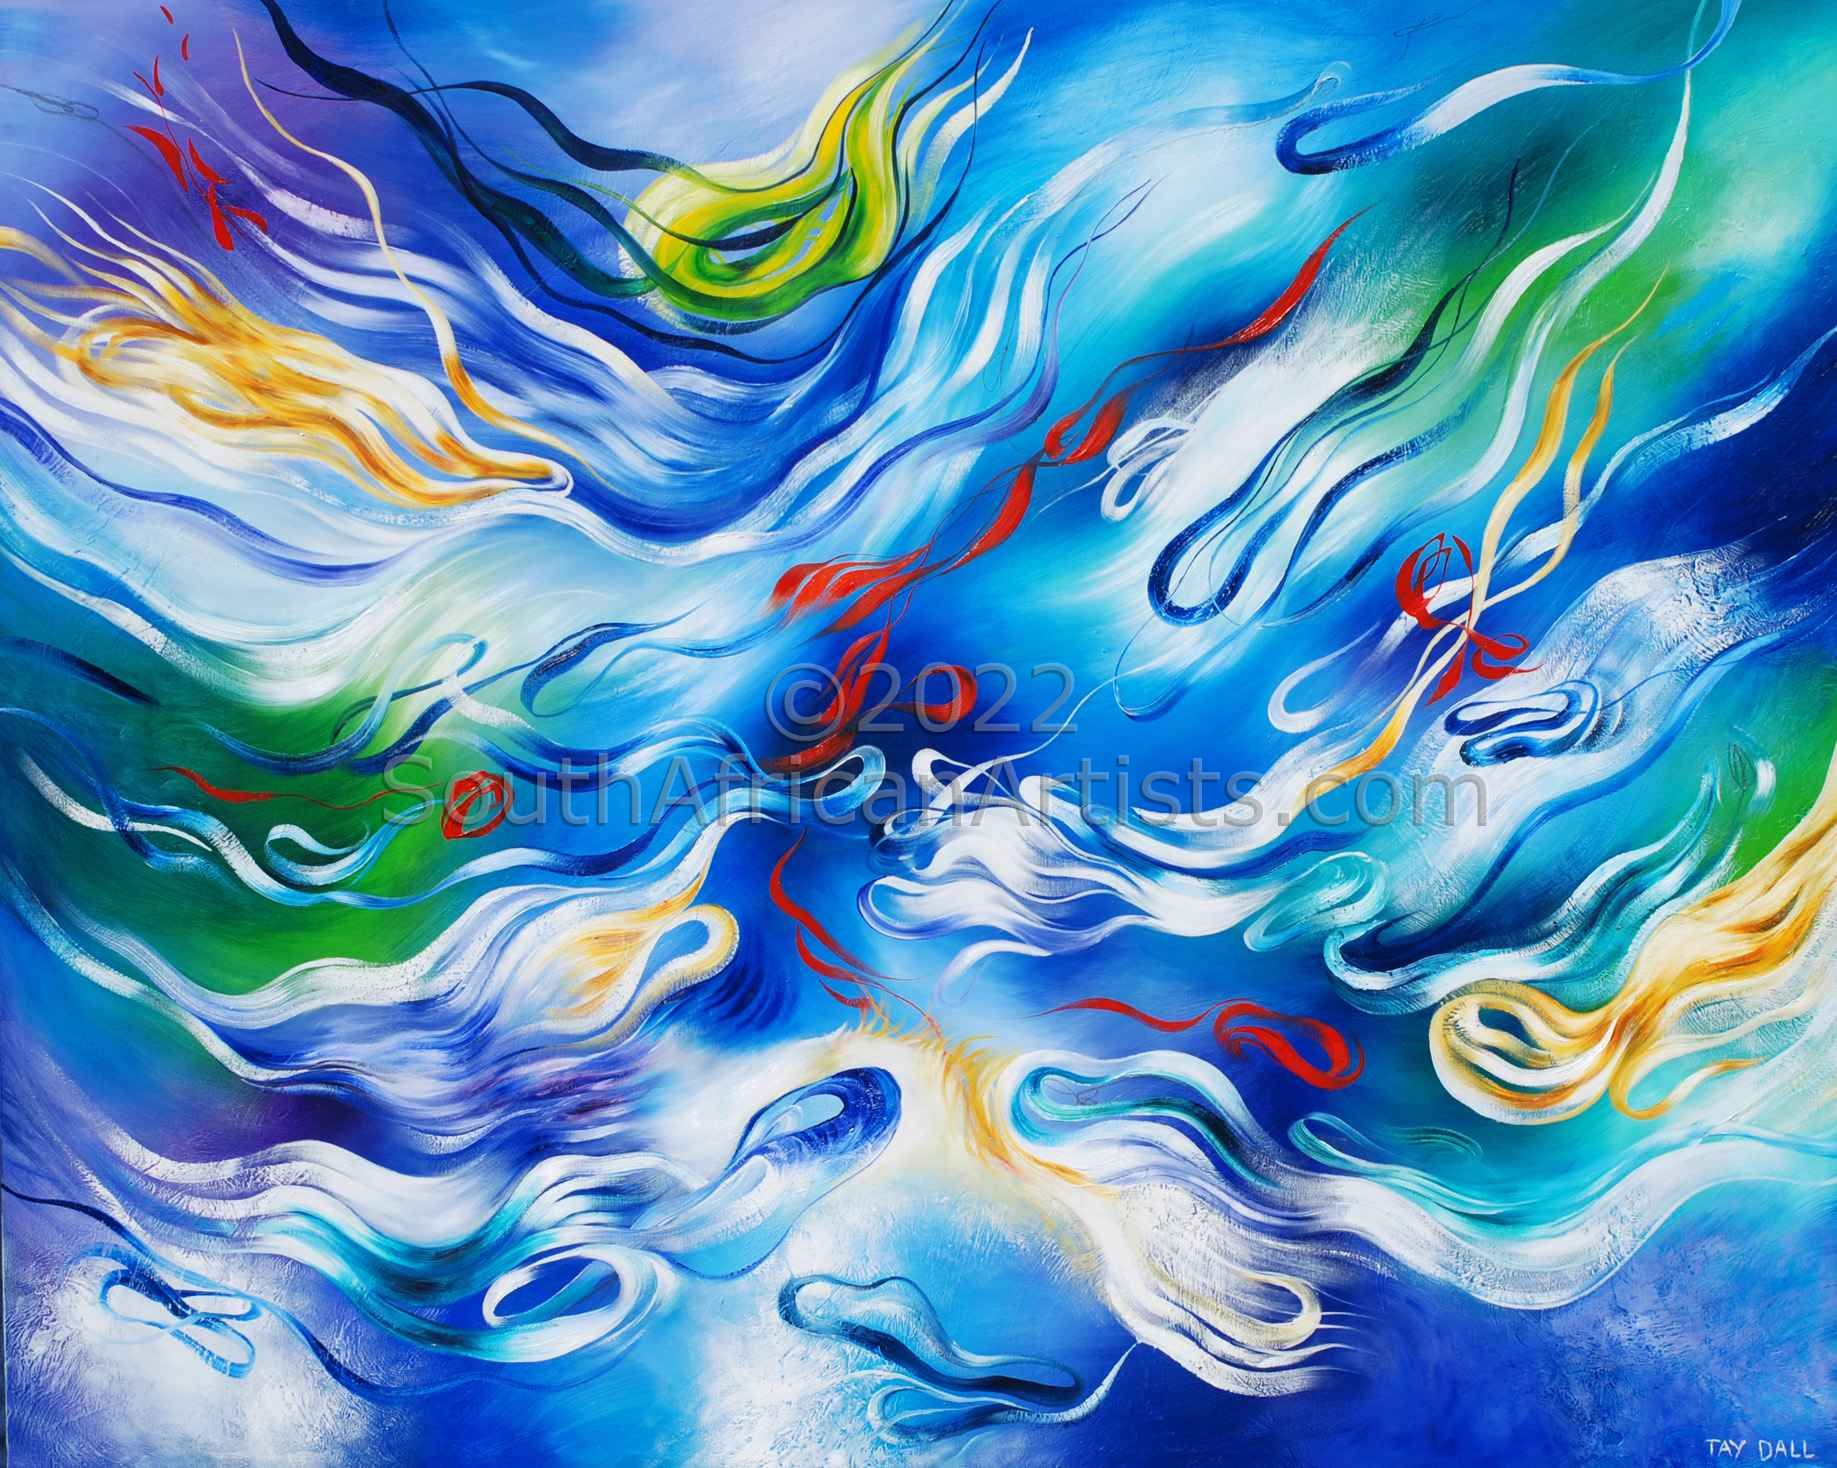 Large Riverflow - 2903